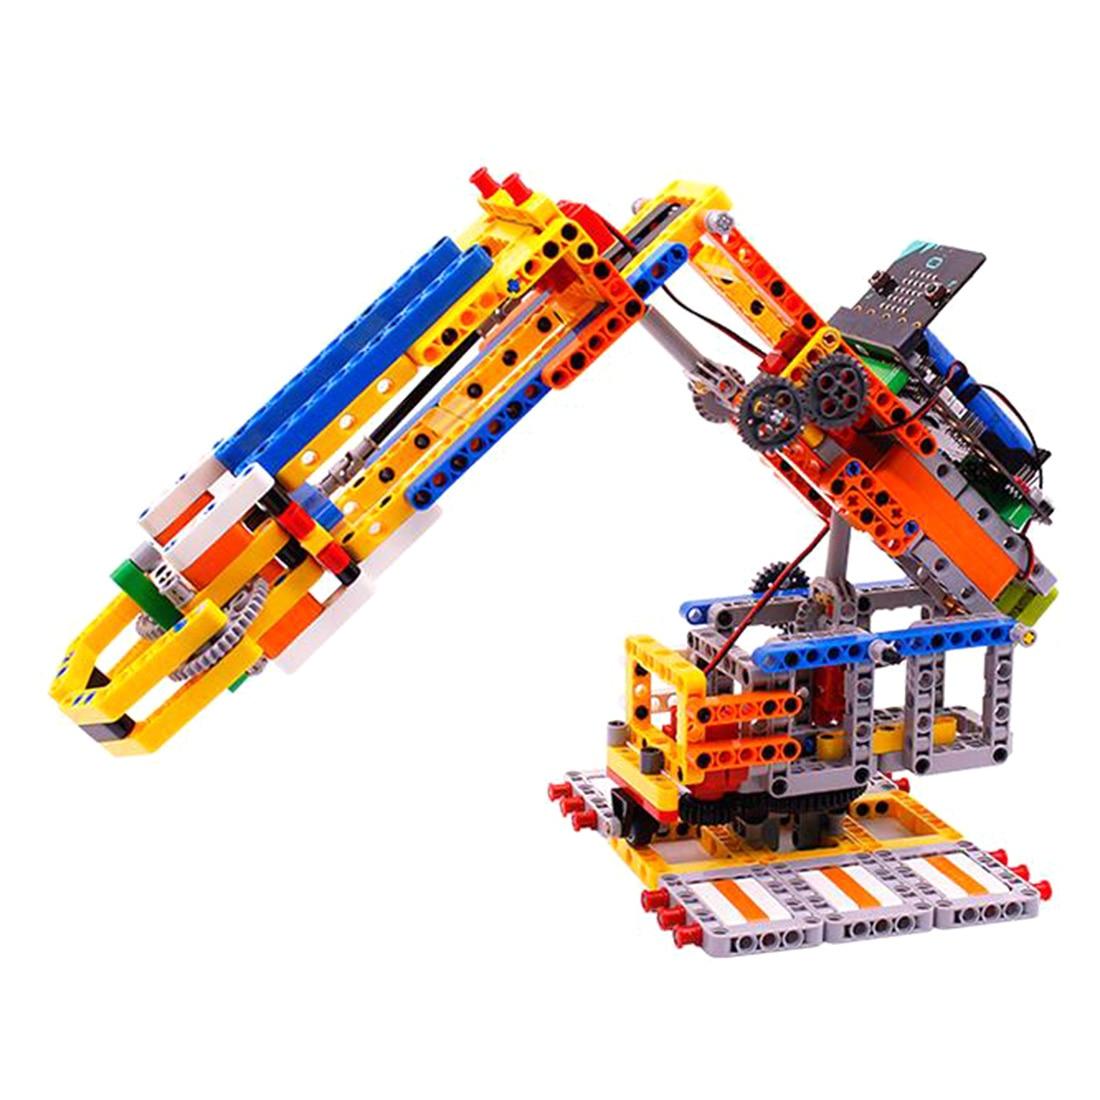 Micro:Bit Programmable Building Block DIY Smart Robotic Arm Kit Brain-Training Toy For Children Educational Toys Birthday Gift